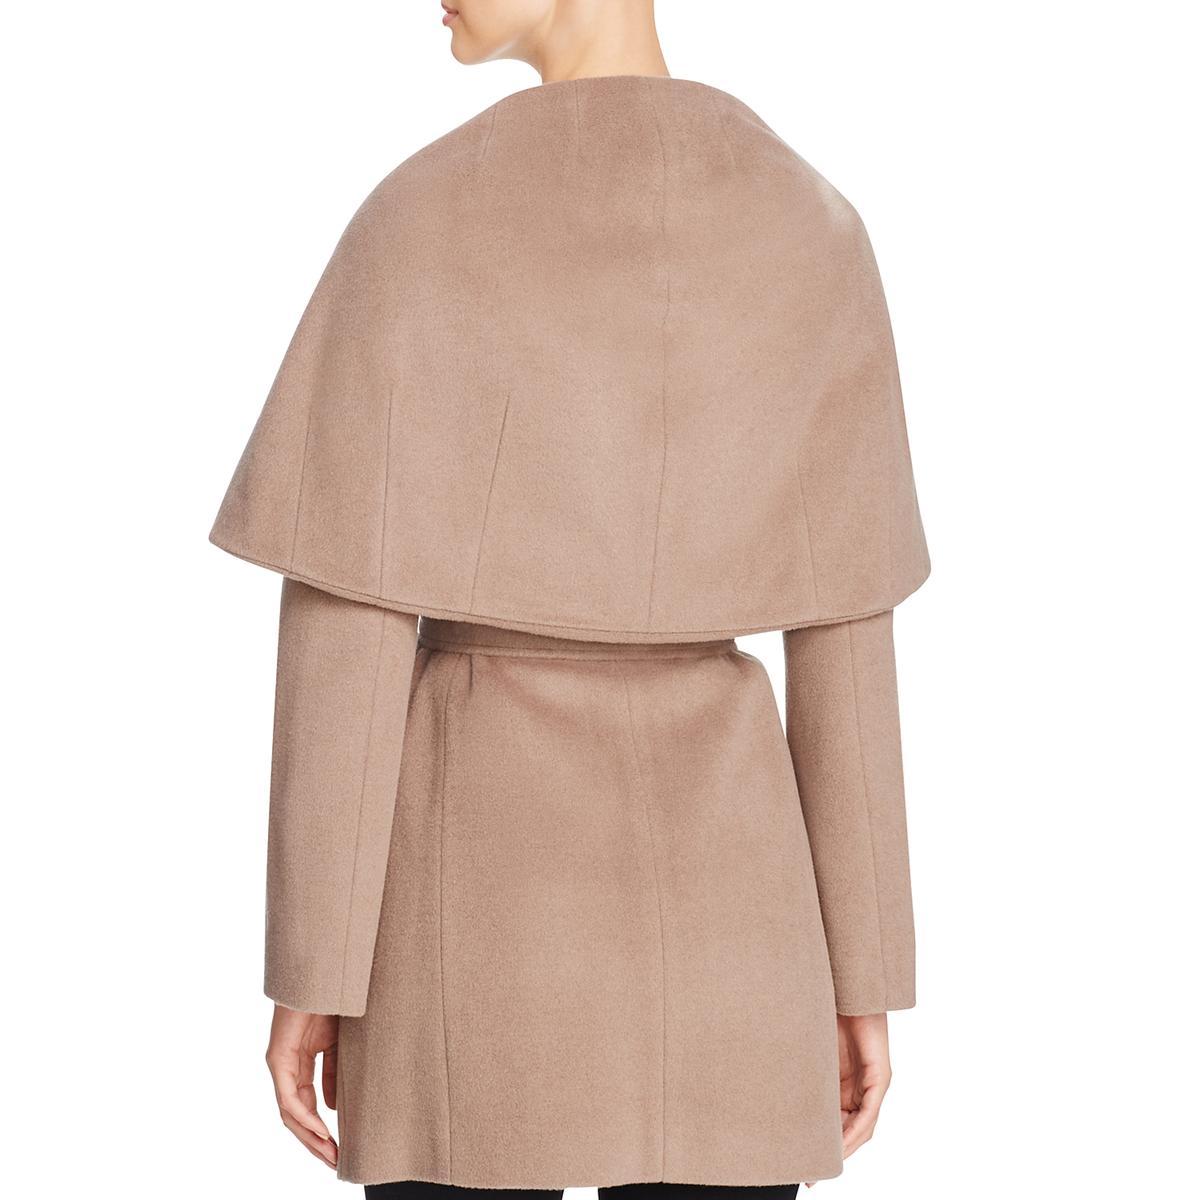 T-Tahari-Marla-Women-s-Oversized-Collar-Wool-Wrap-Coat thumbnail 6